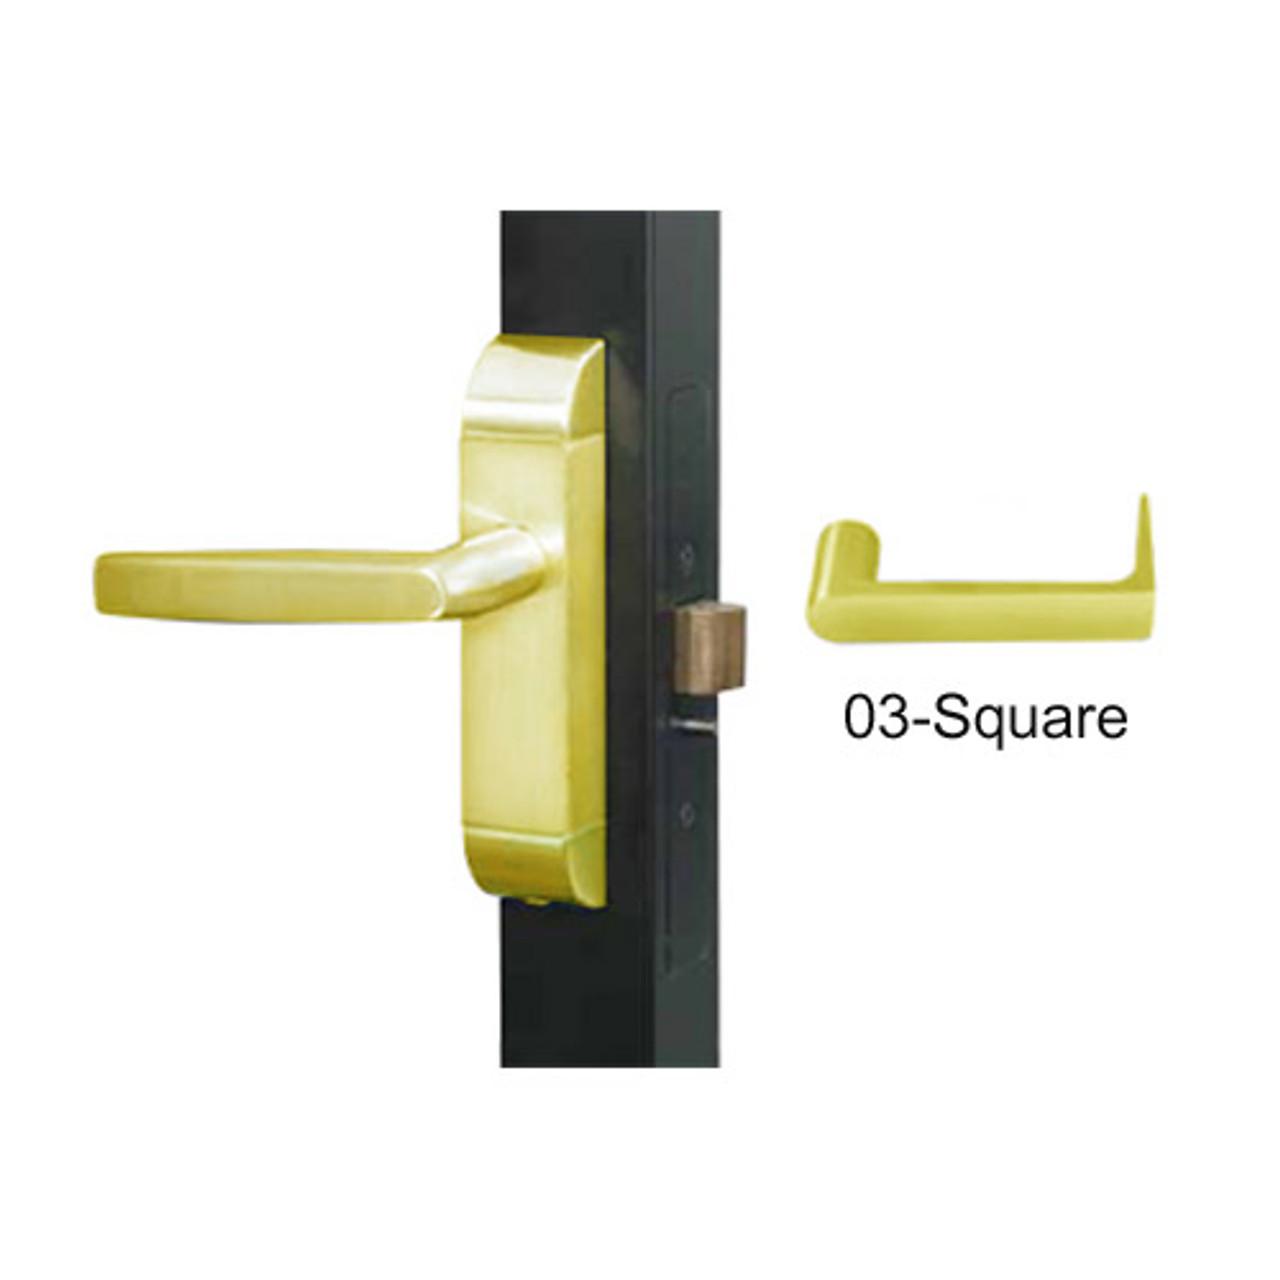 4600-03-542-US3 Adams Rite Heavy Duty Square Deadlatch Handles in Bright Brass Finish